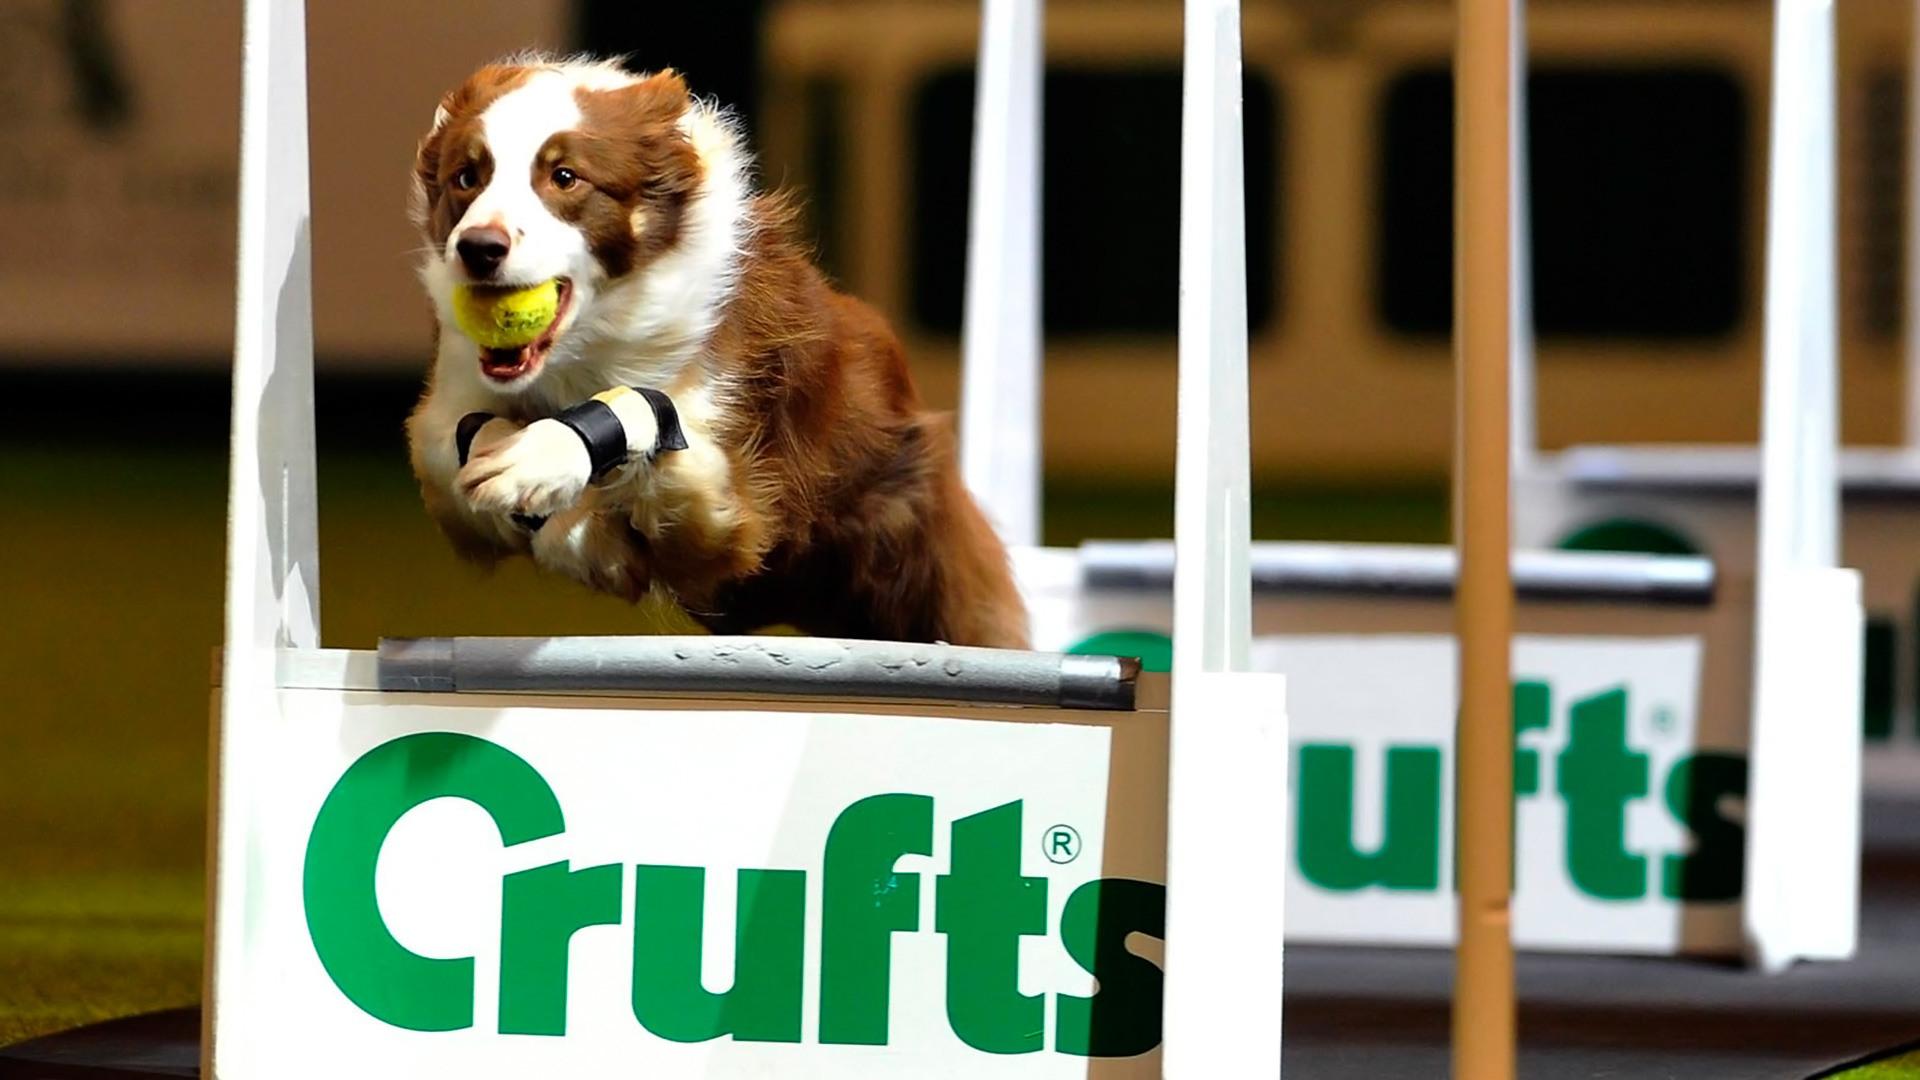 Crufts Dog Show 2018